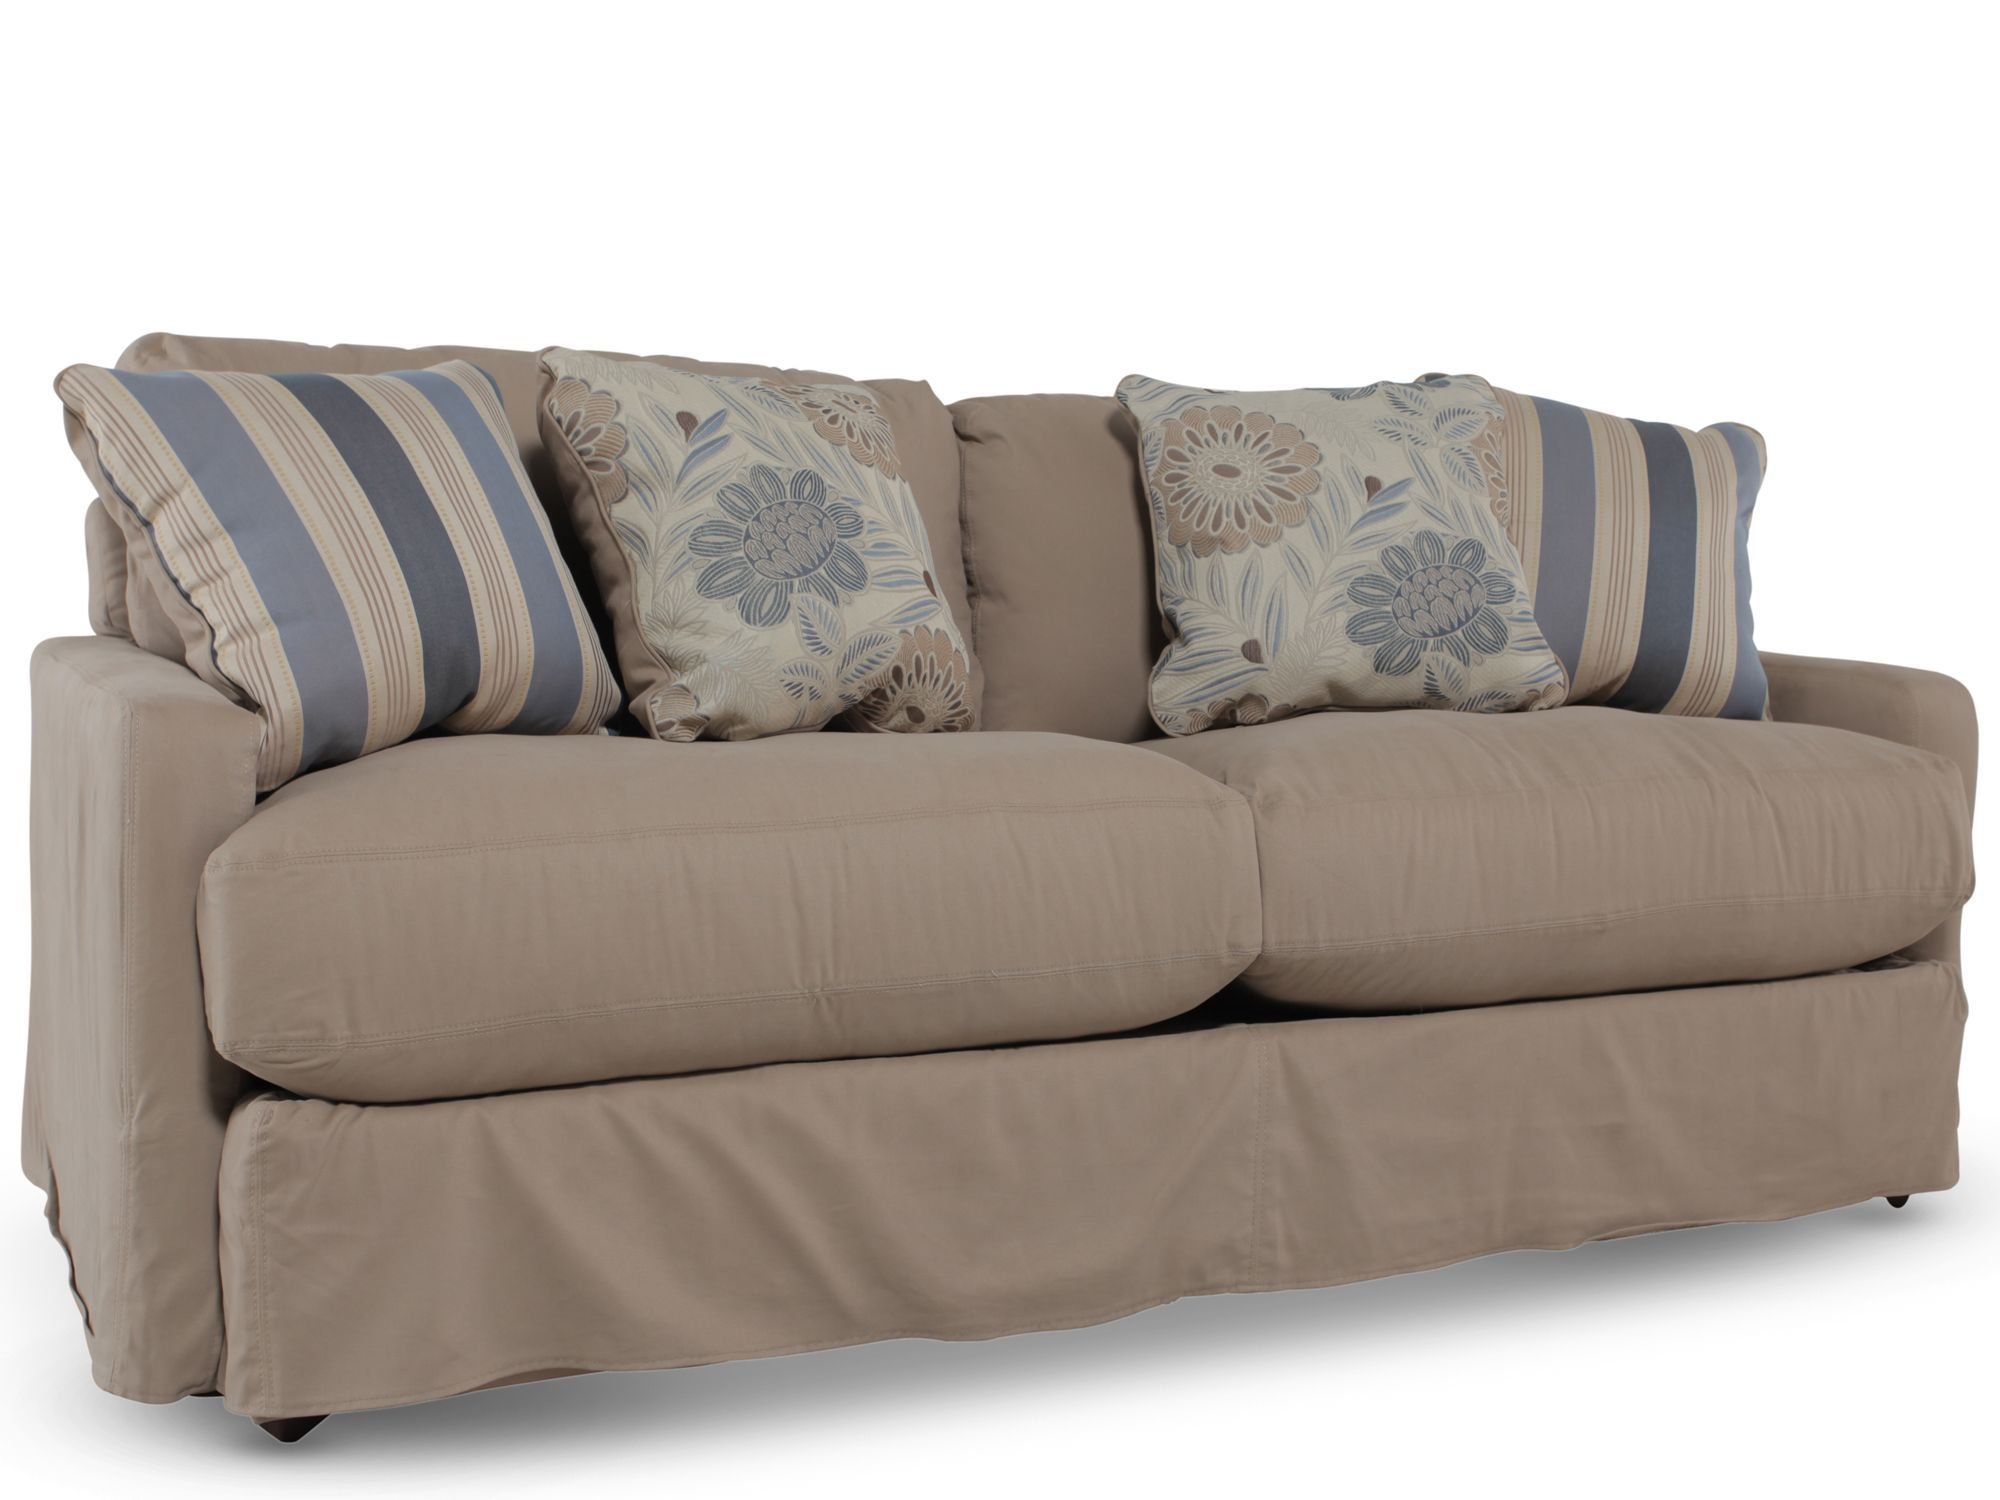 Khaki Couch Ashley Addison Sofa